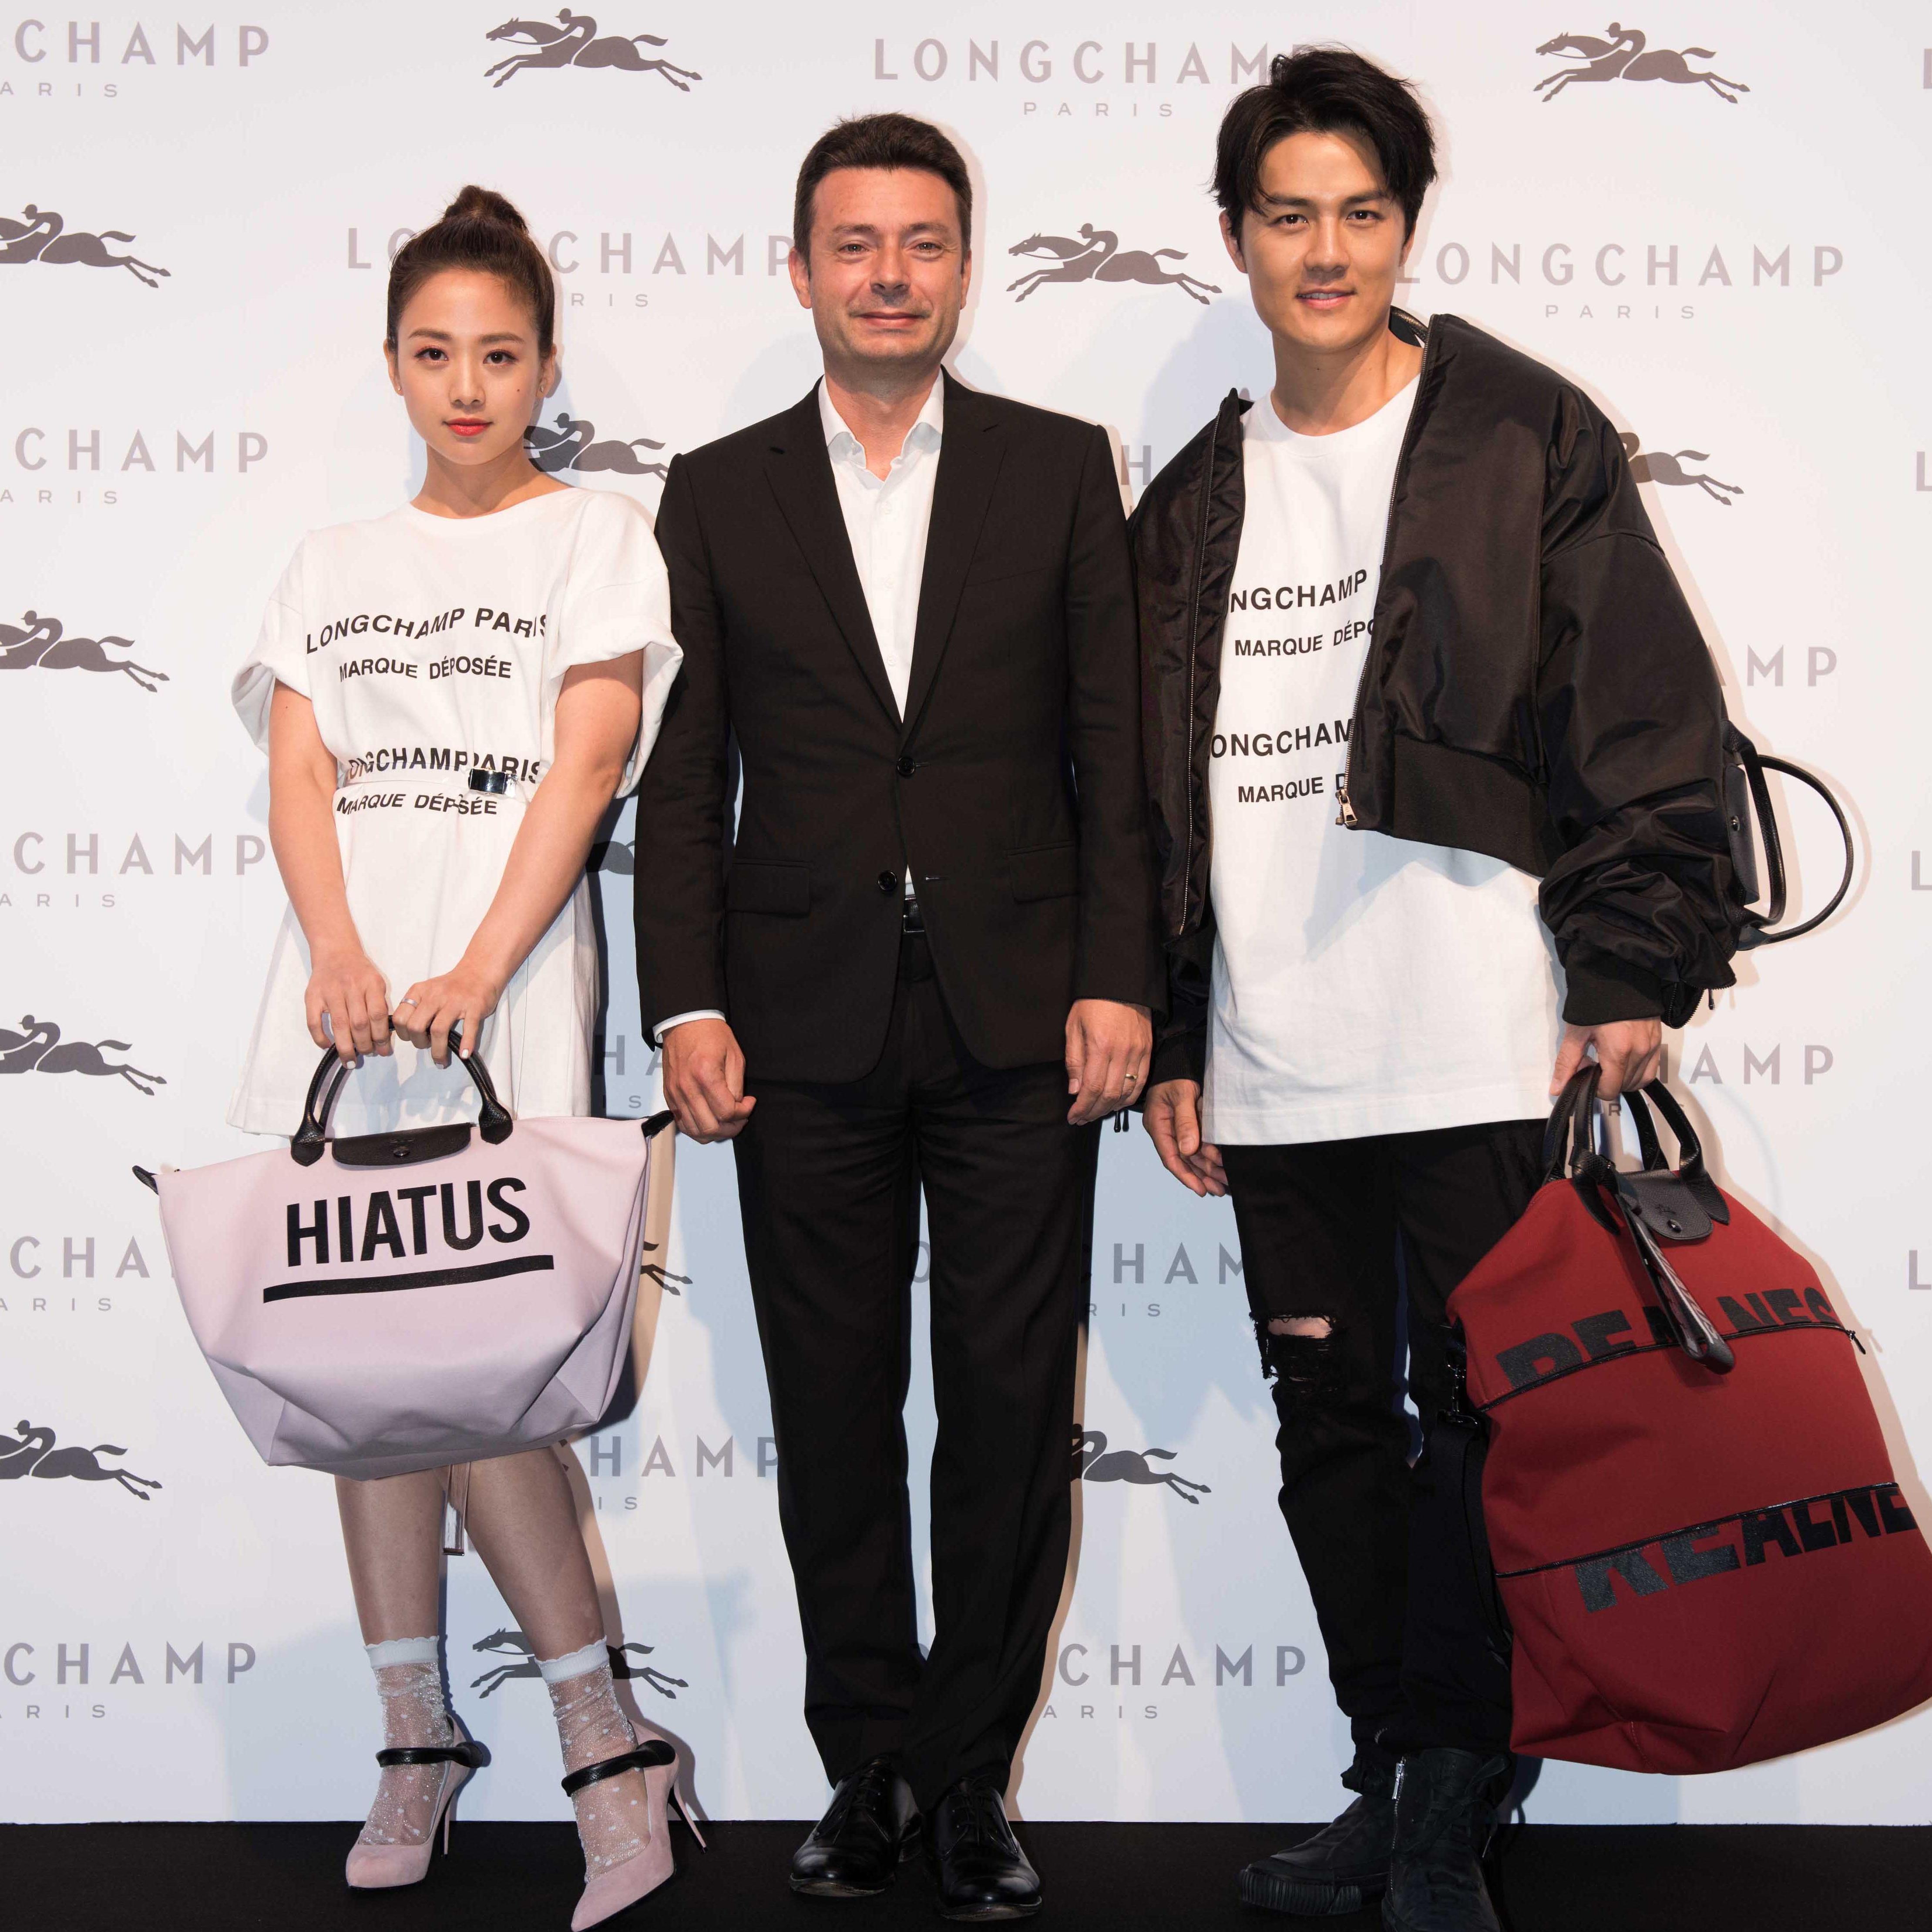 Longchamp by Shayne Oliver 聯名系列,台北 101 旗艦店獨家開賣!